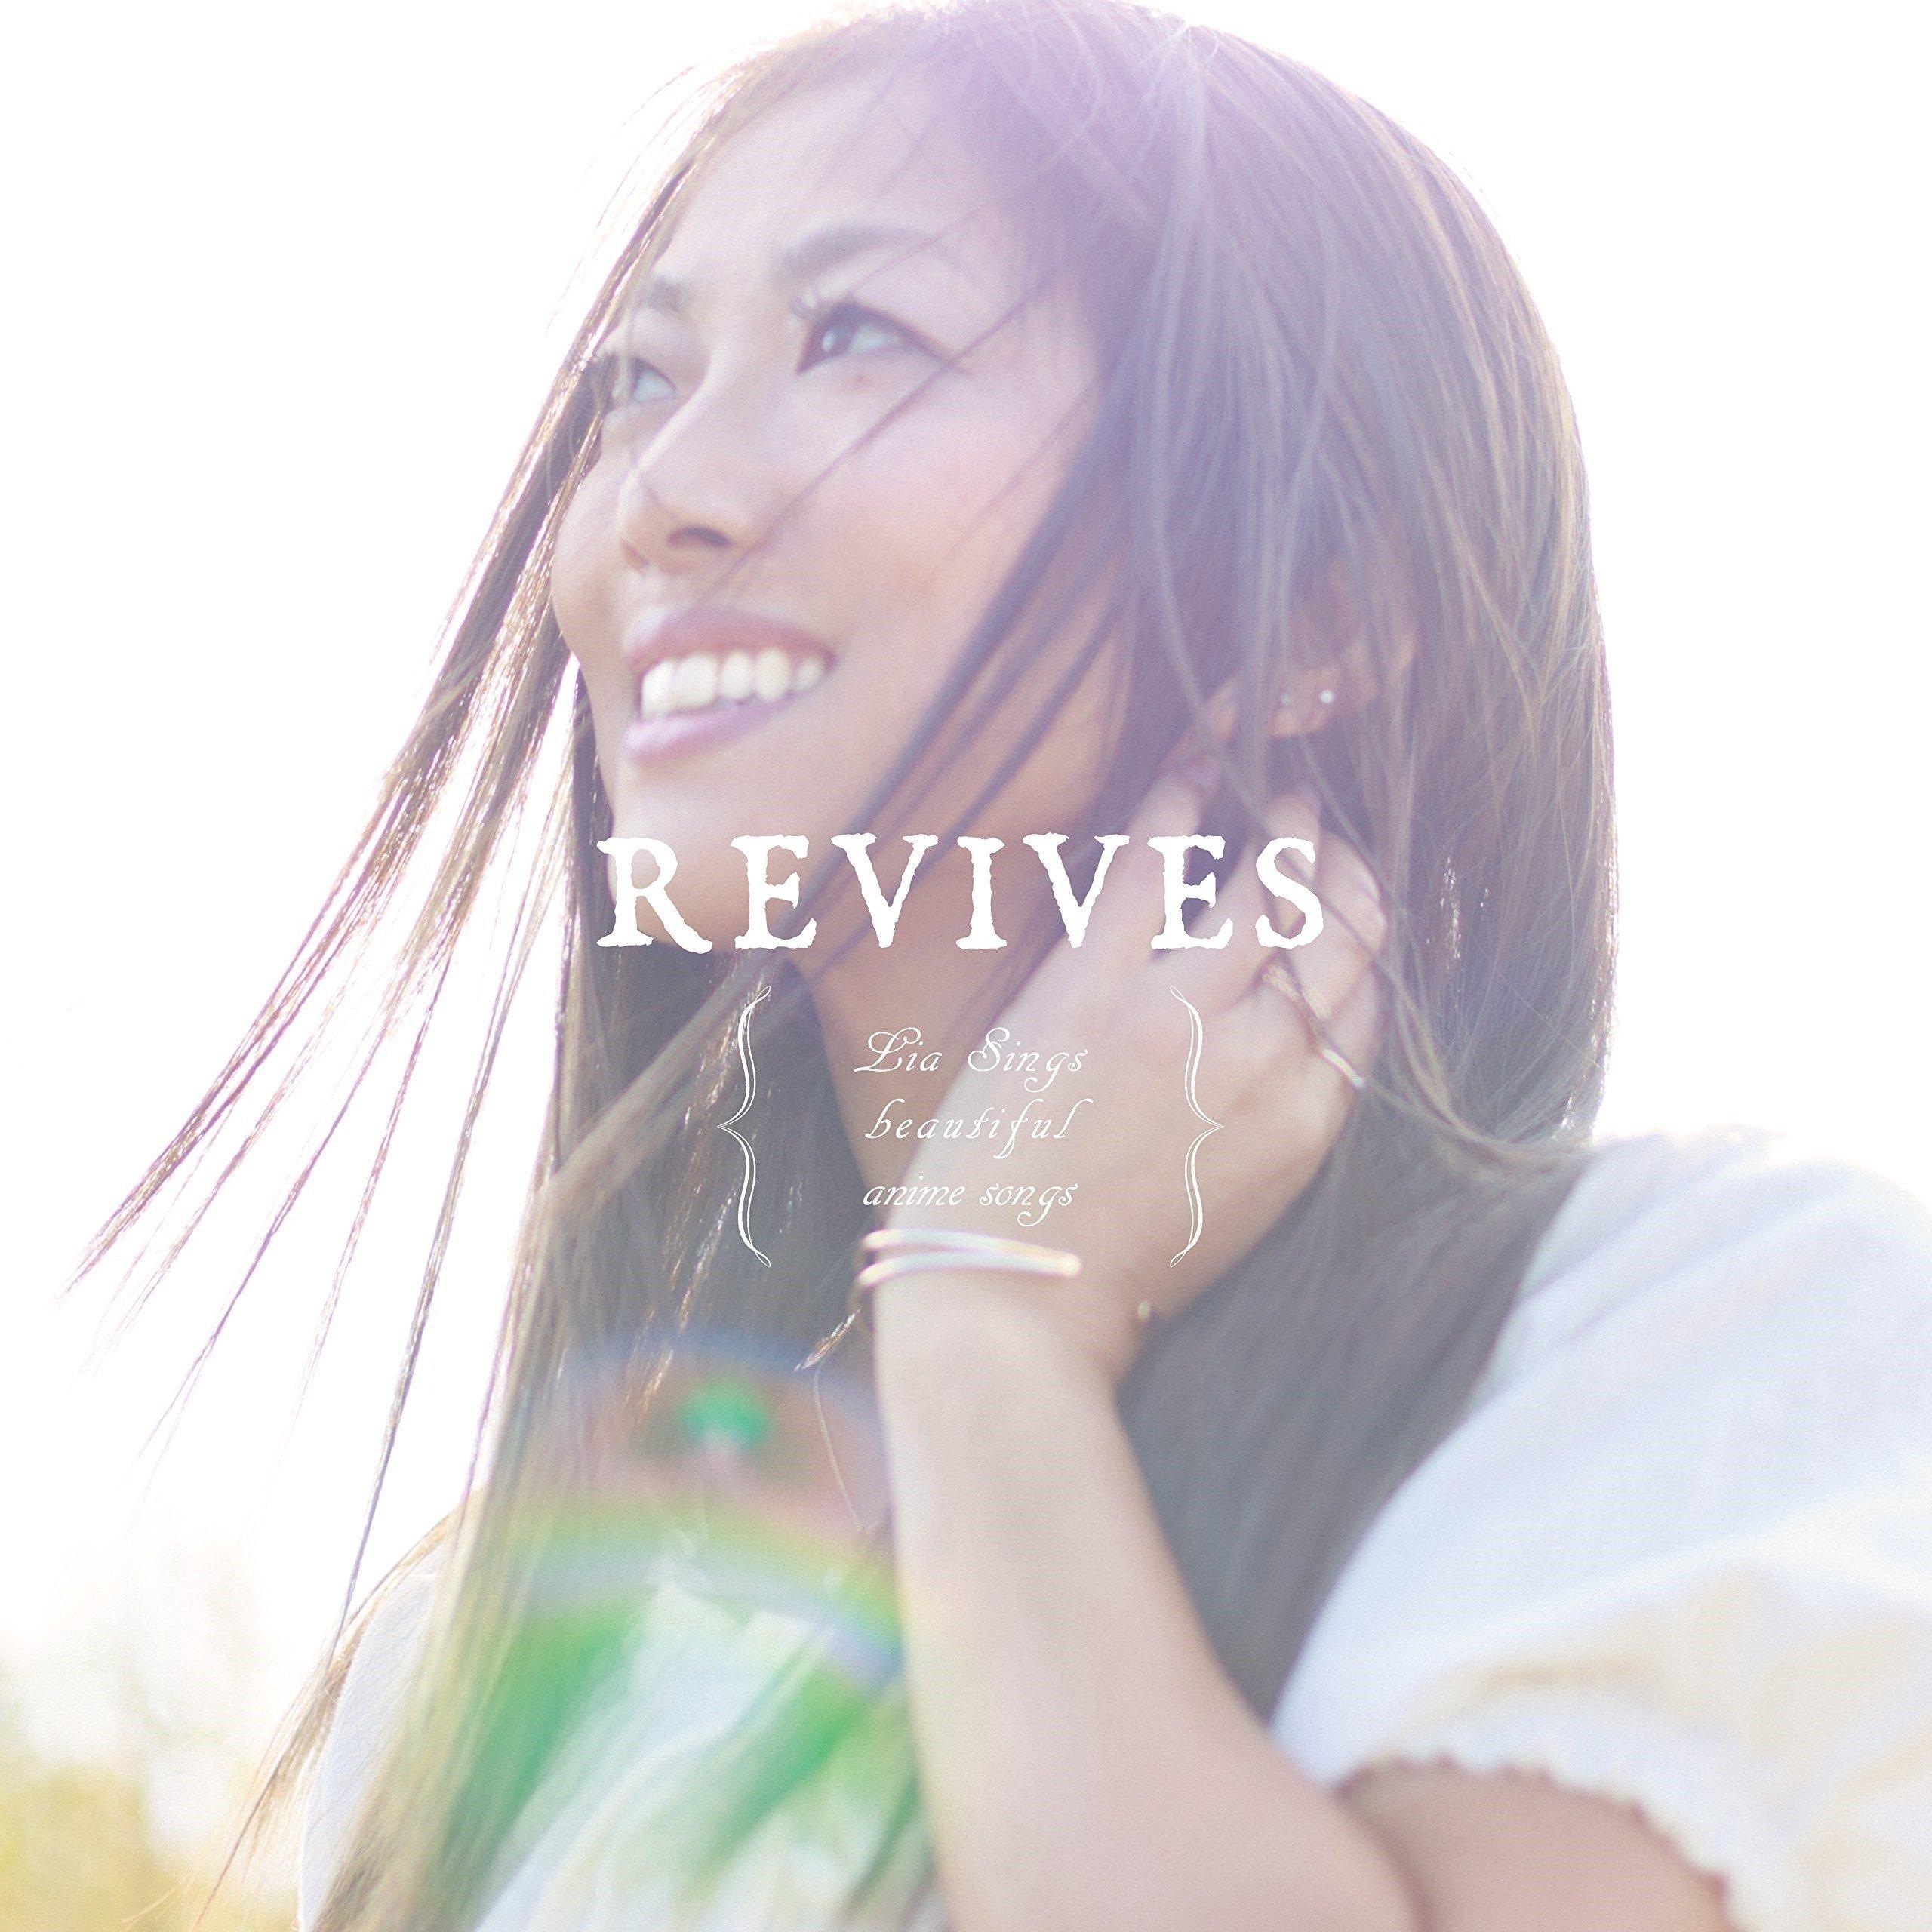 LIA – REVIVES -Lia Sings beautiful anime songs- [Mora FLAC 24bit/96kHz]